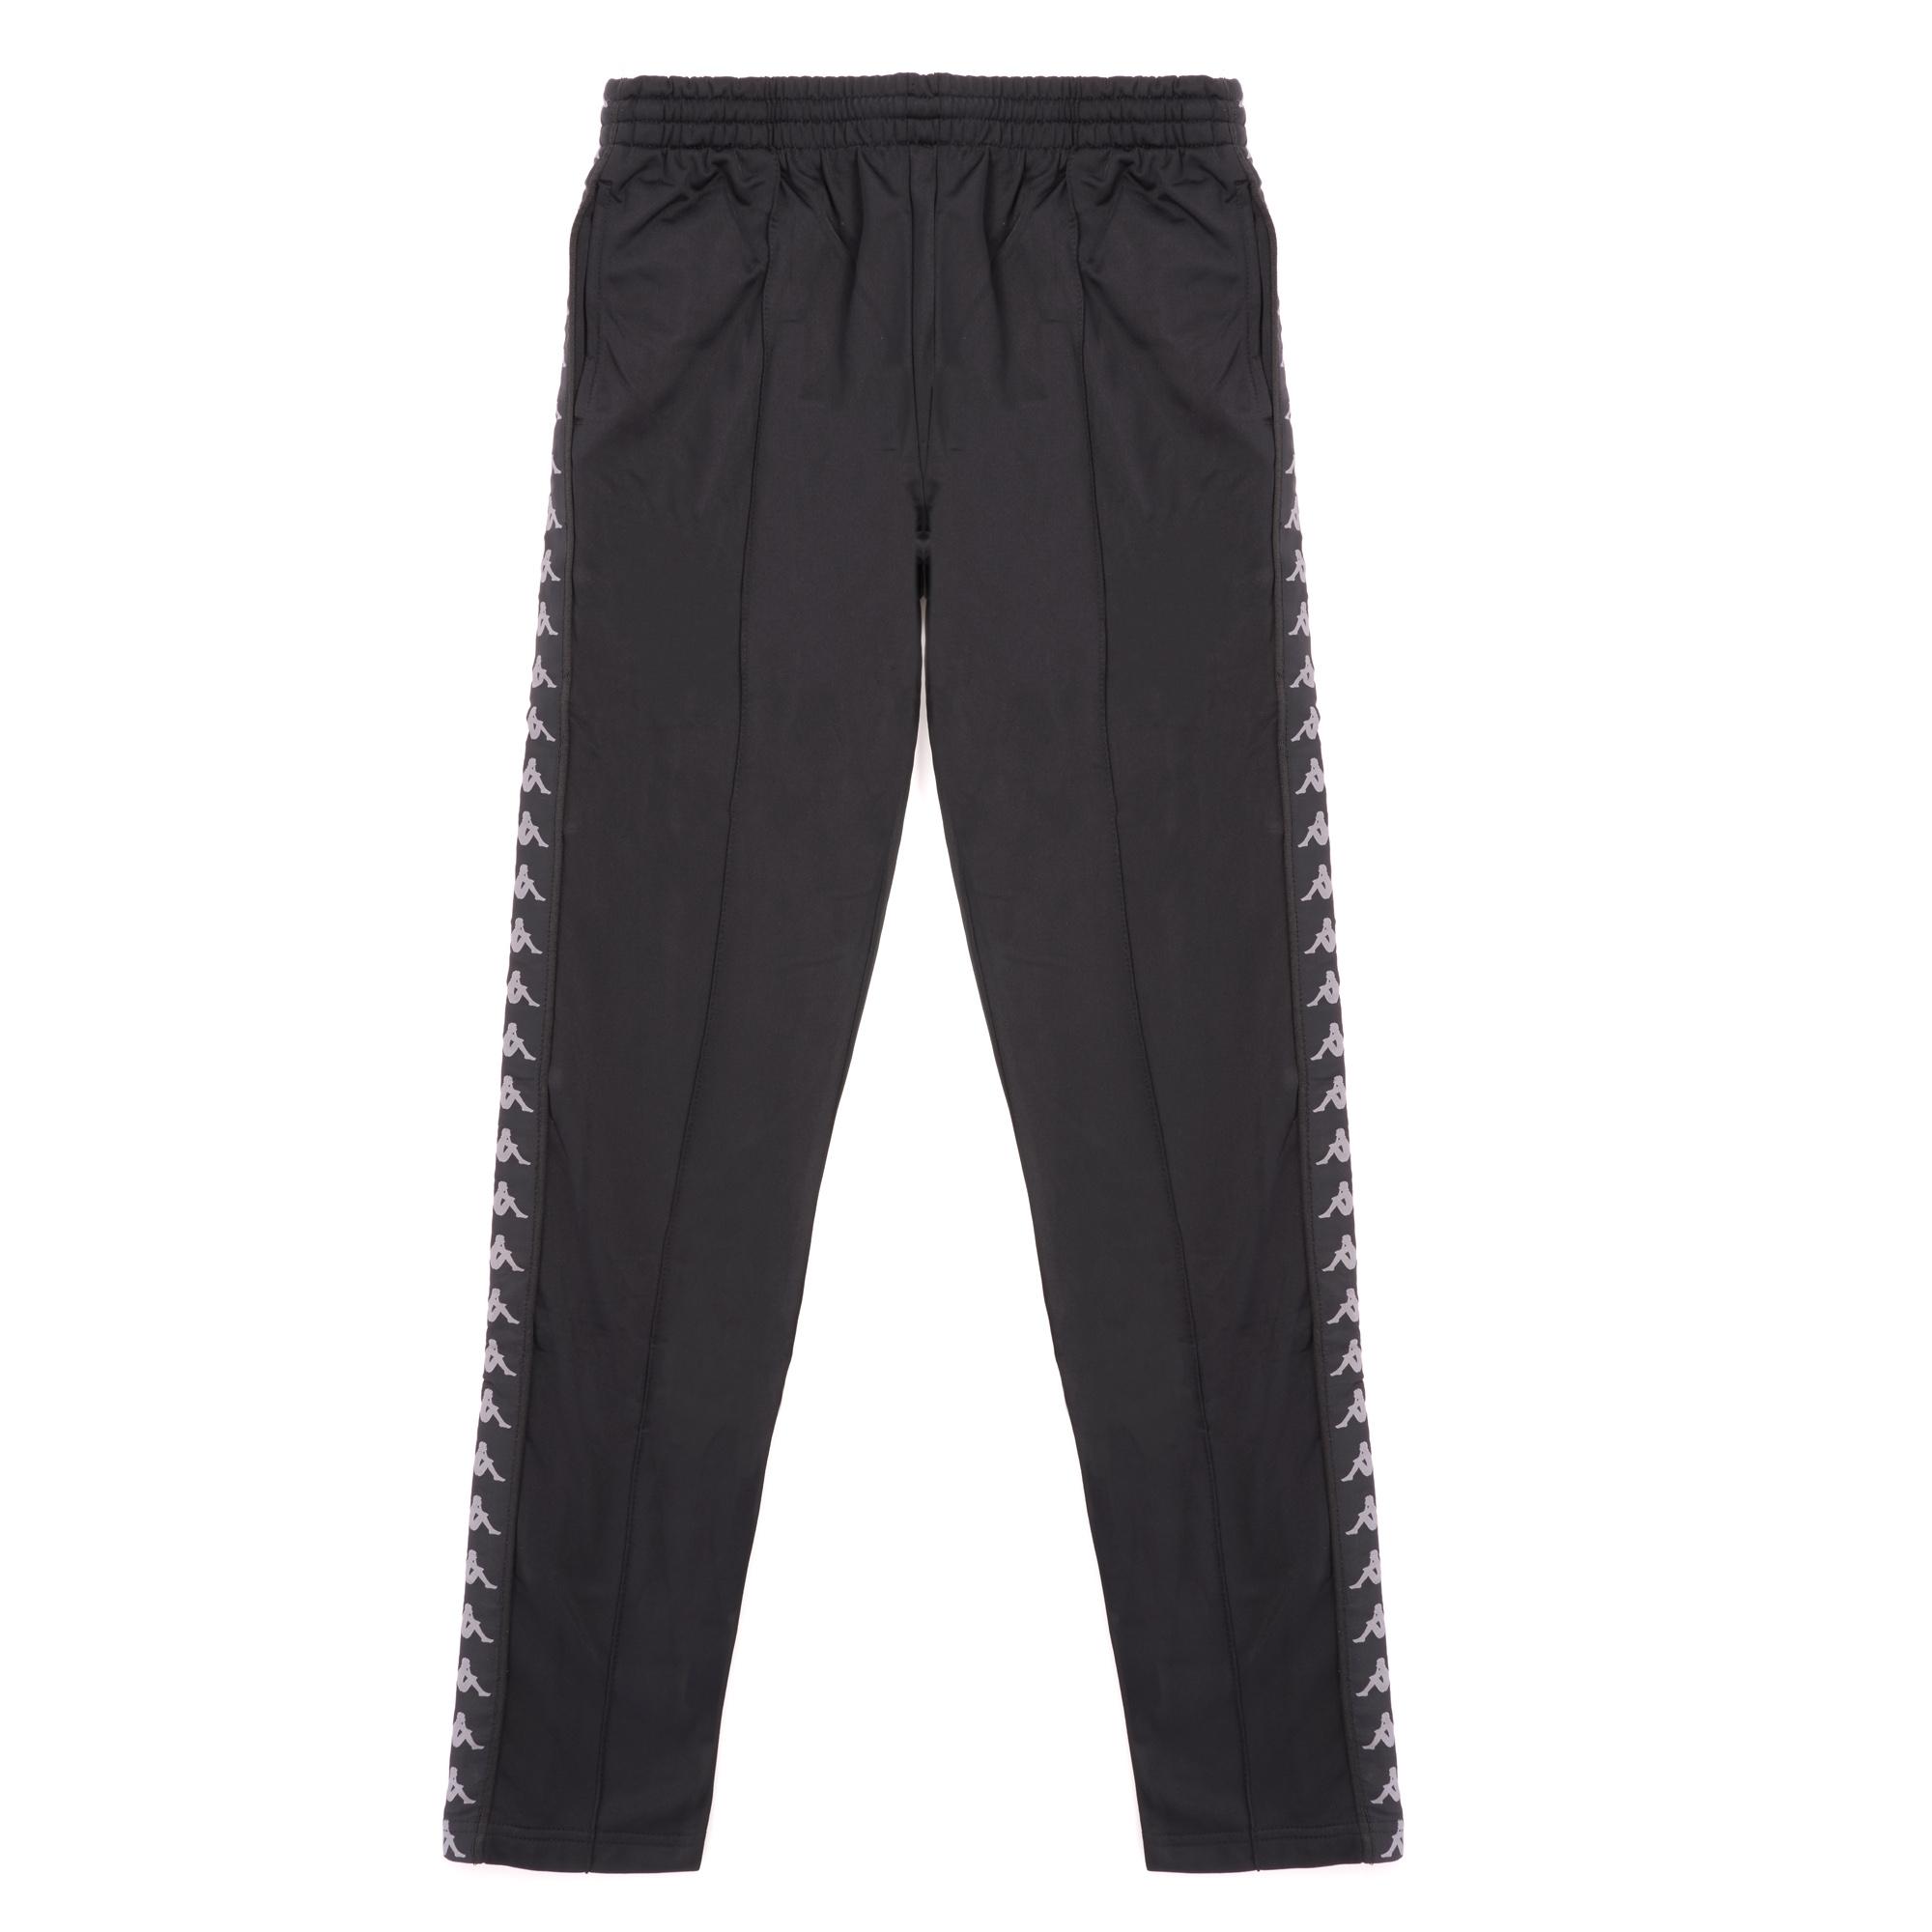 7783572d3d6 Kappa Astoria Track Pants | Black | 303KUE0-C23